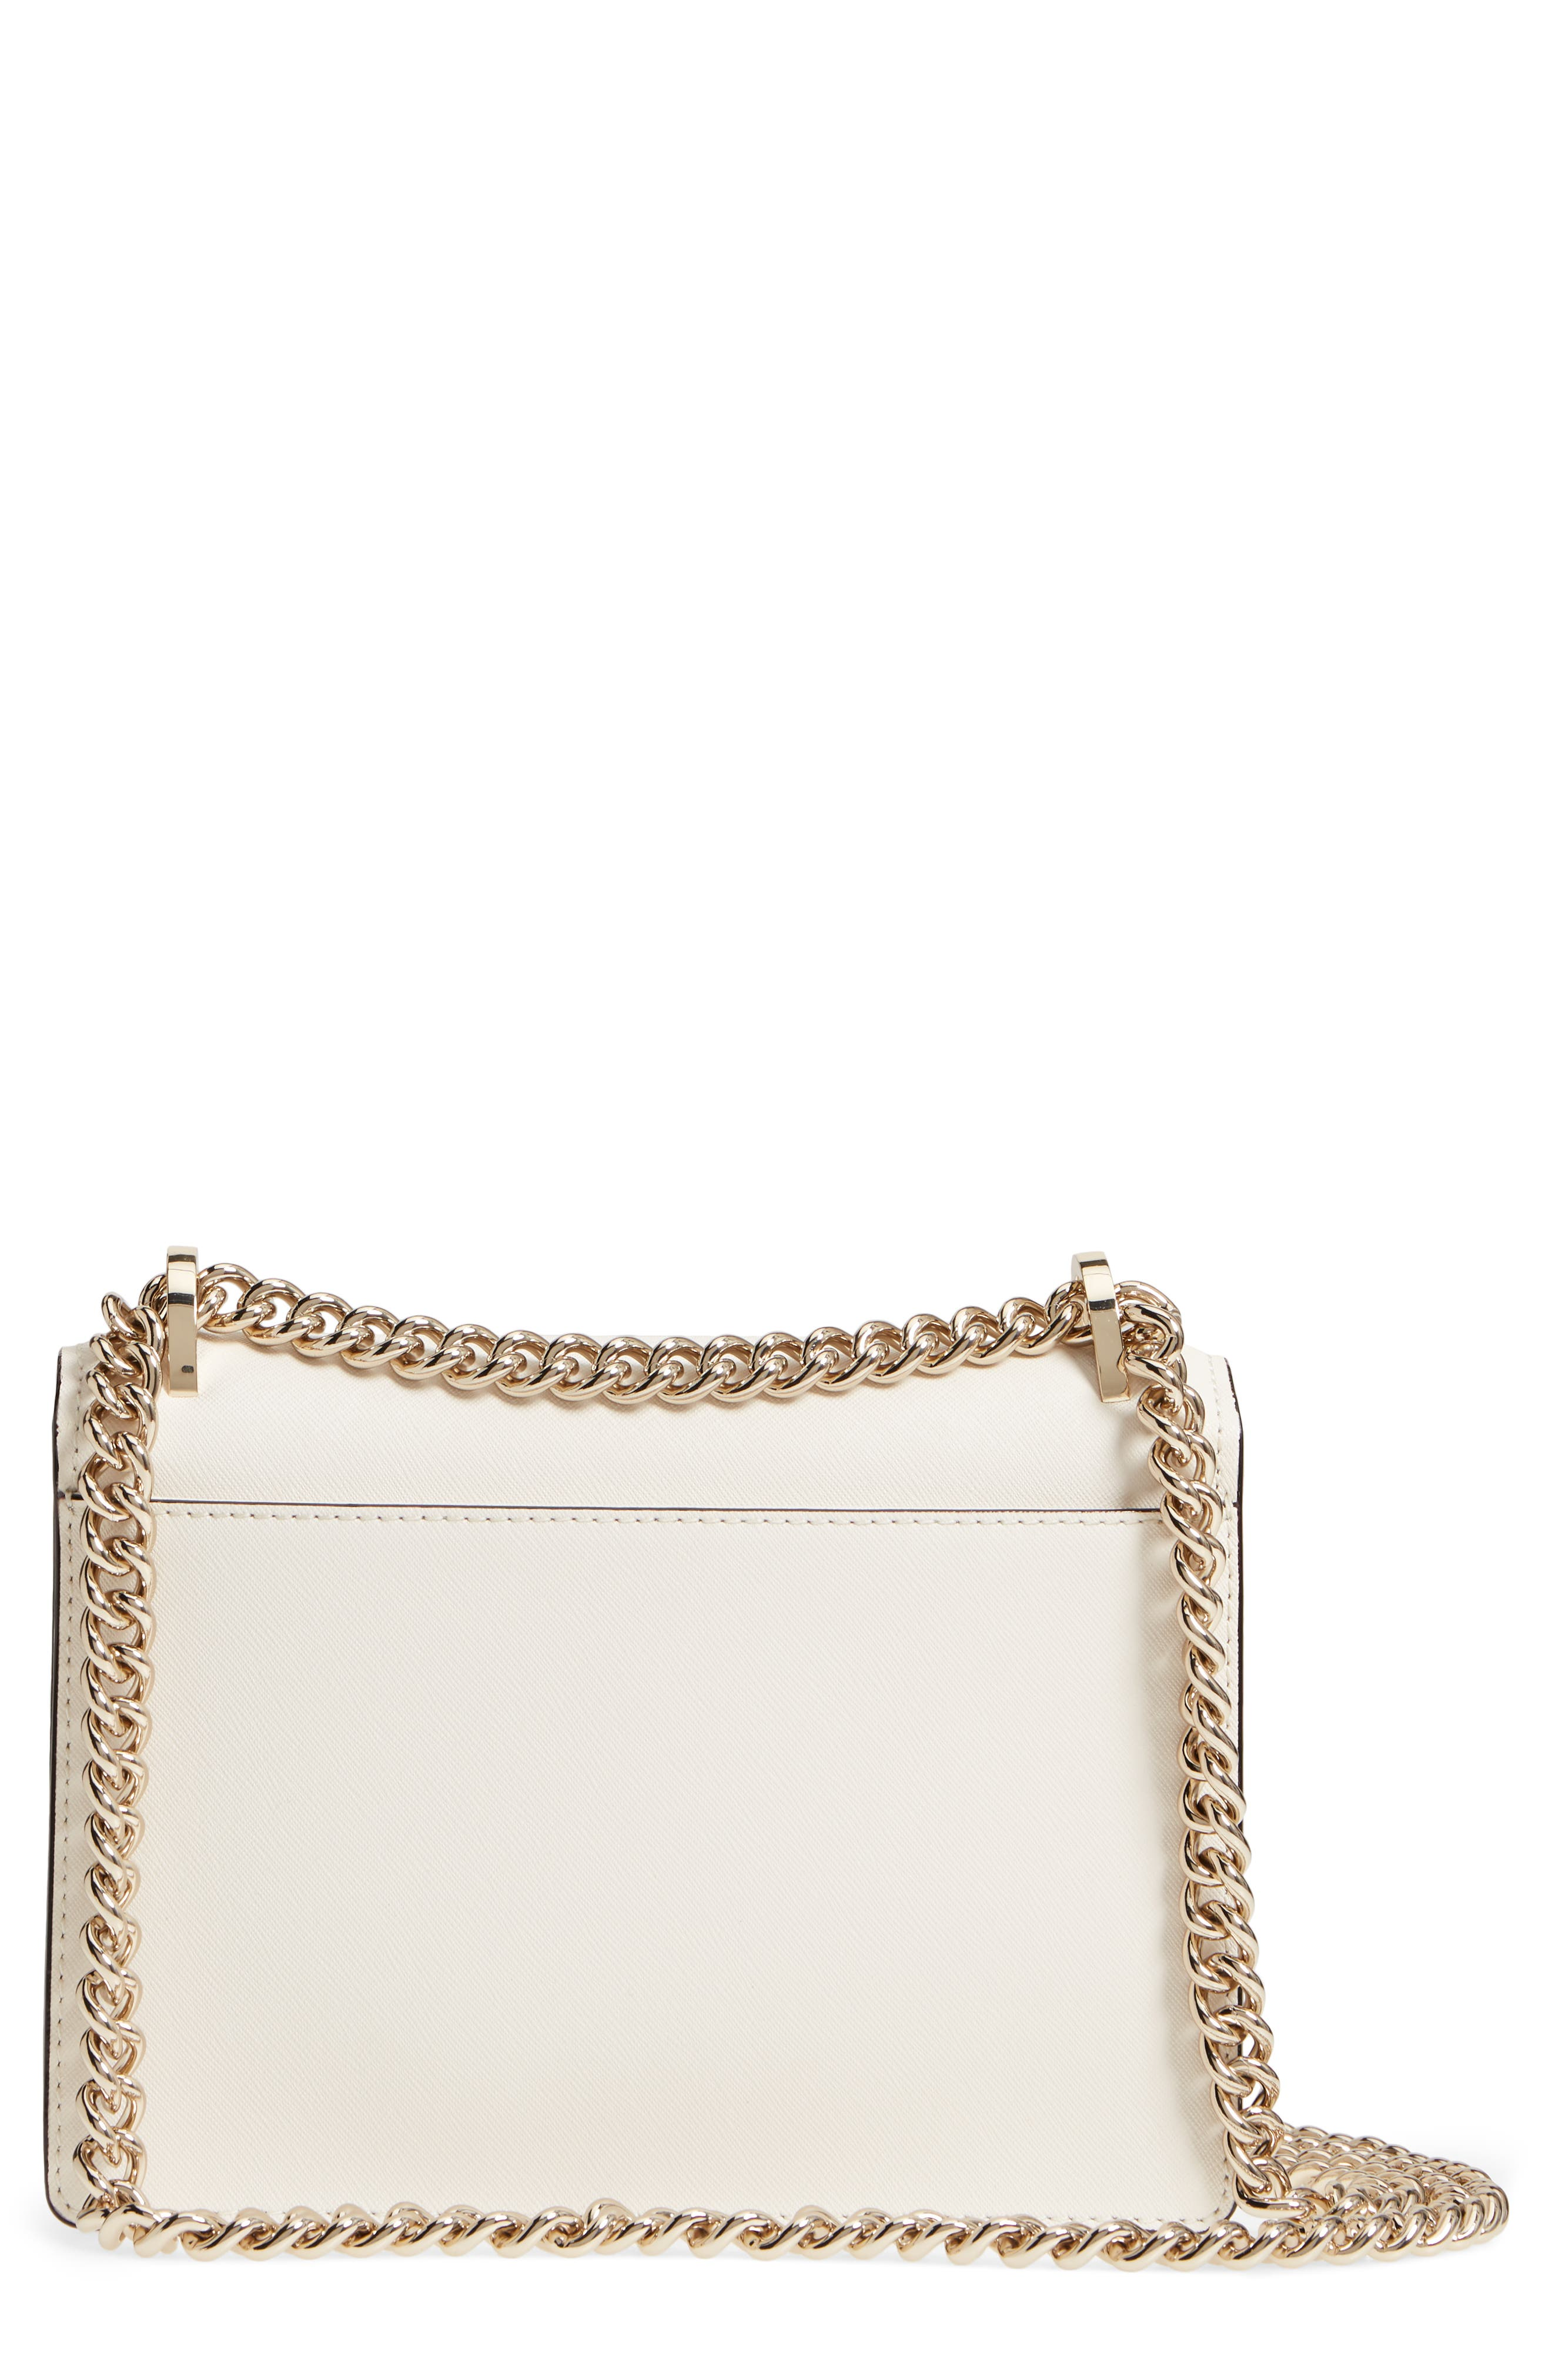 cameron street marci leather shoulder bag,                             Alternate thumbnail 7, color,                             Cement